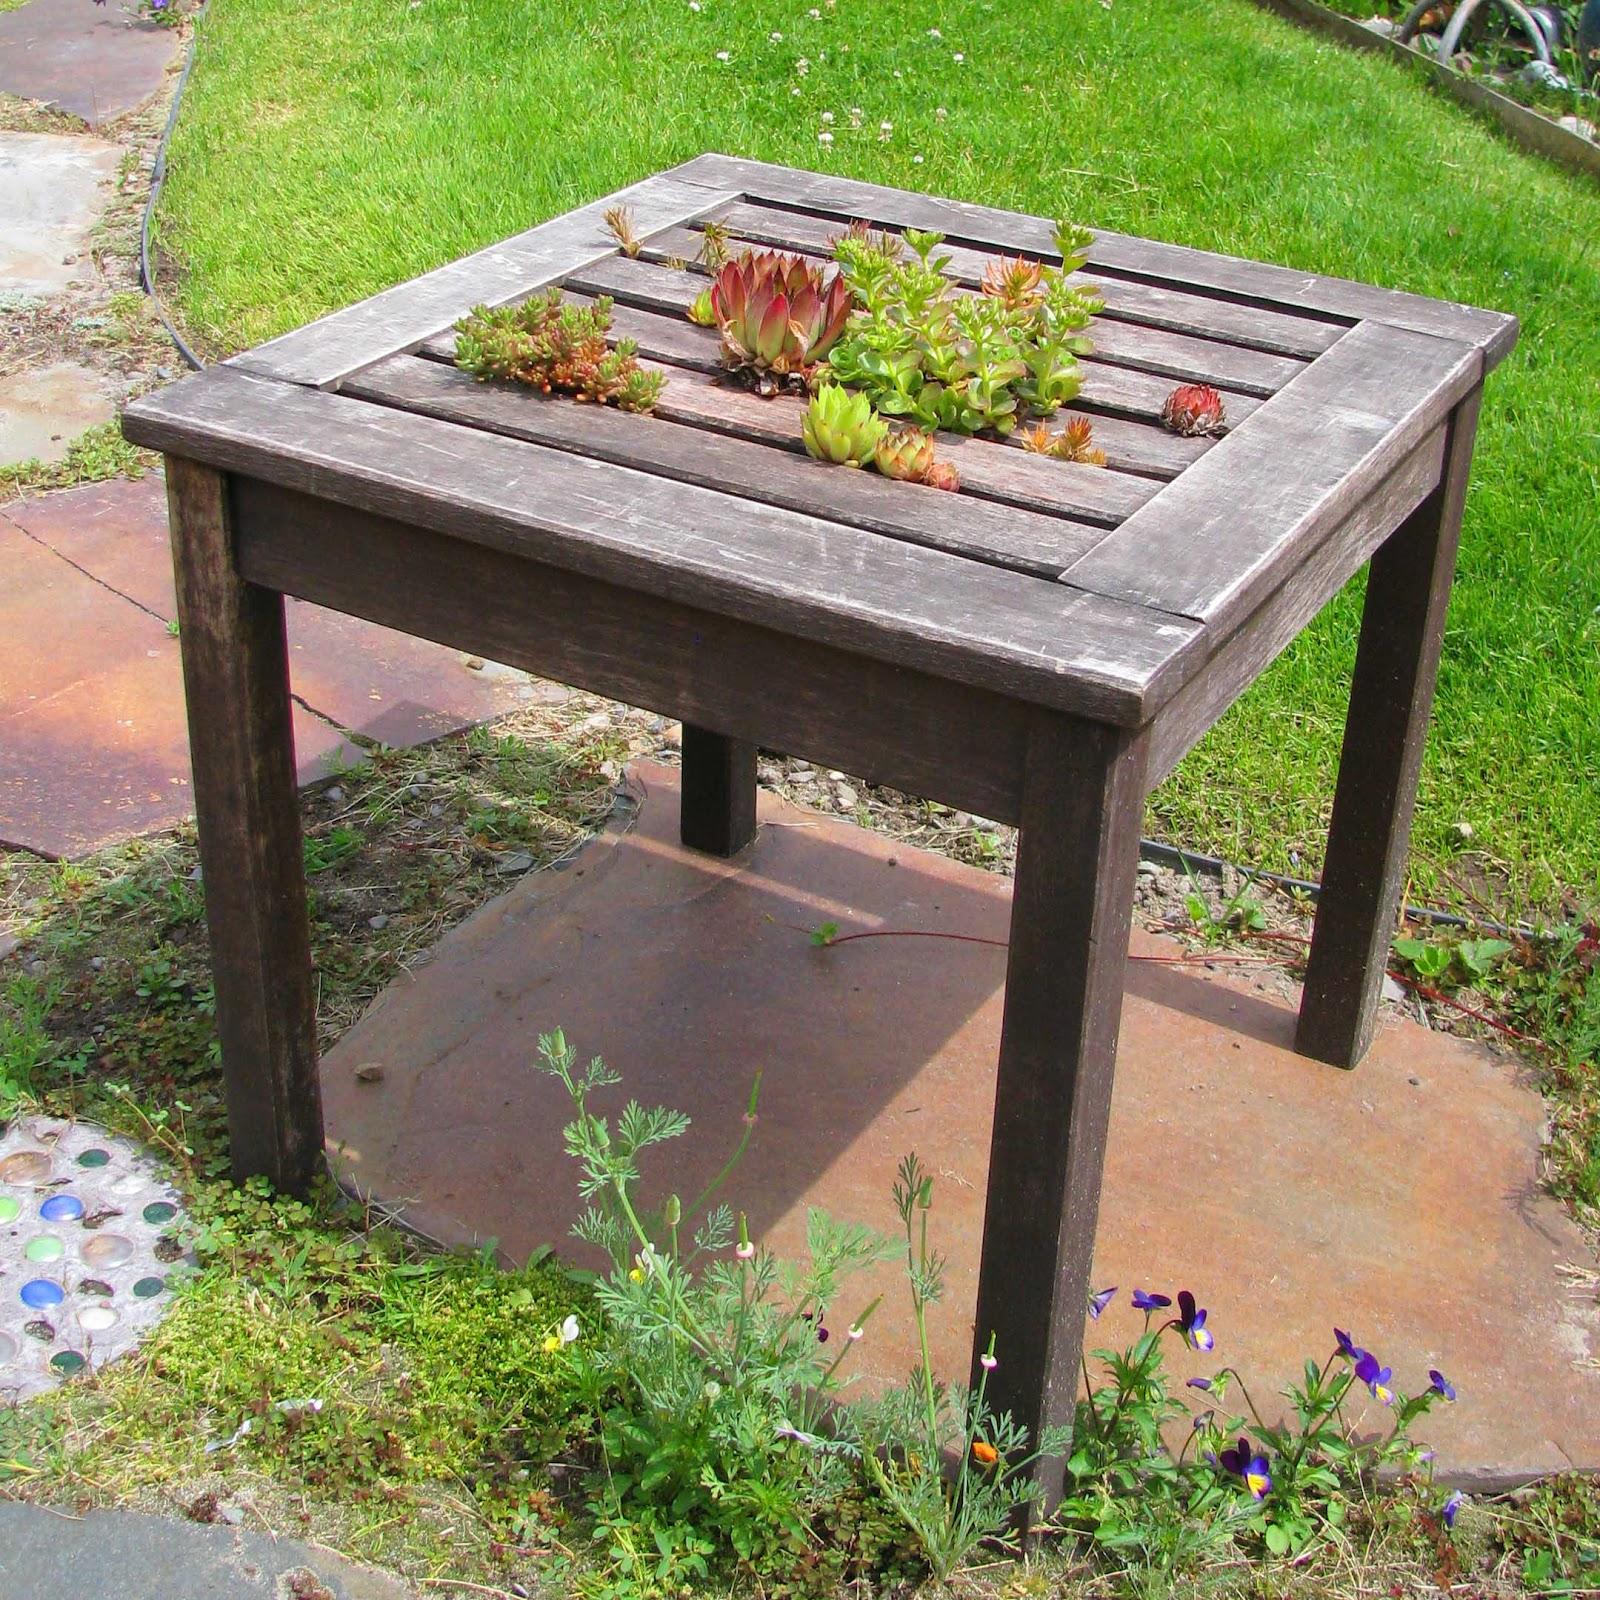 Do It Yourself Garden: Rachel S. Neal: More Do-It-Yourself Garden Art